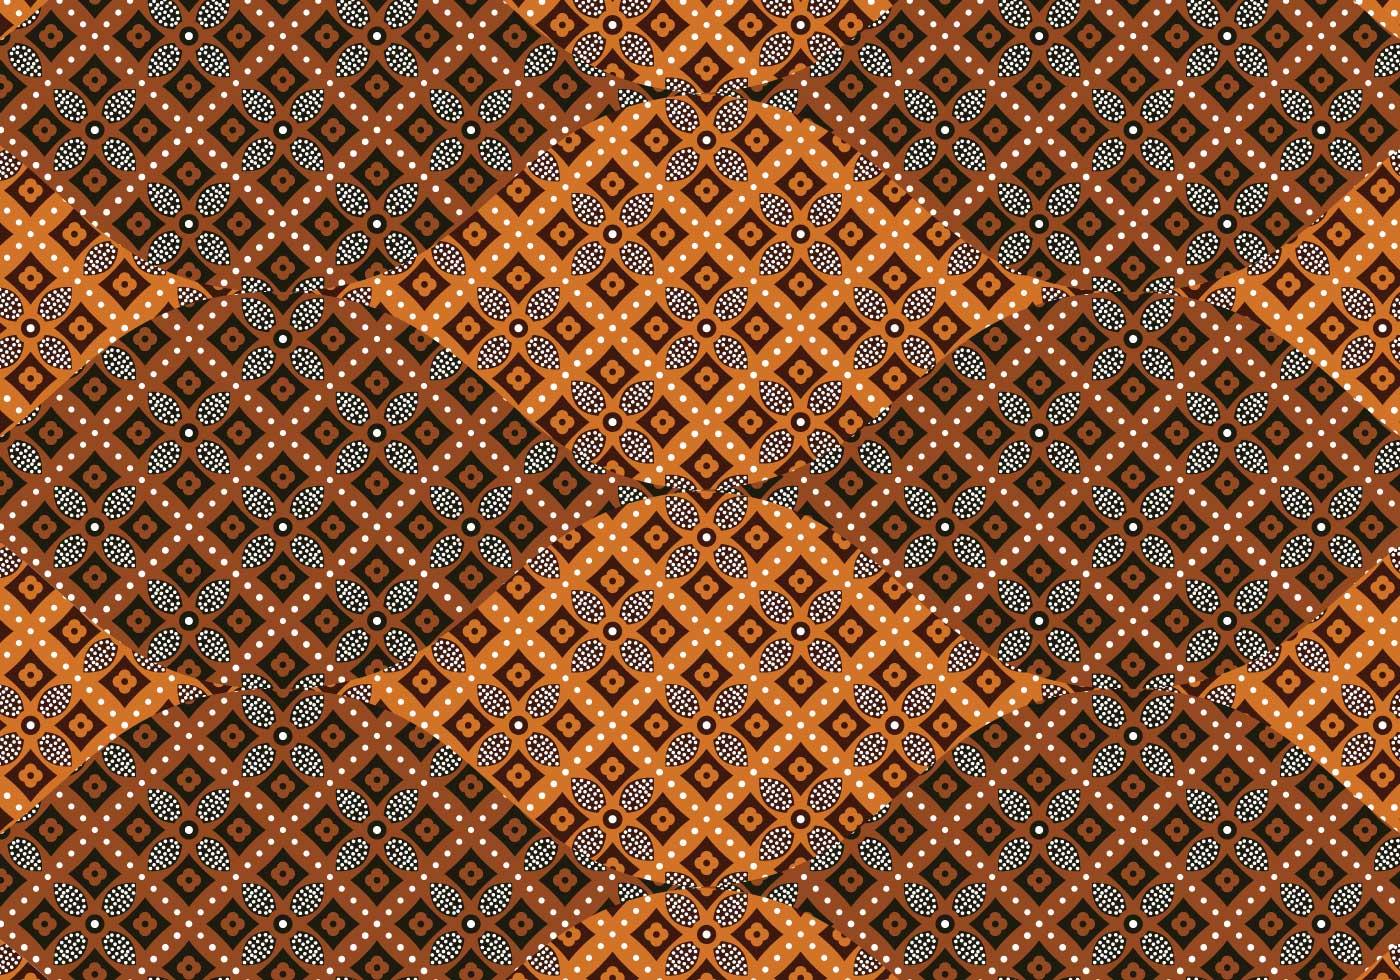 batik background vectors - photo #3